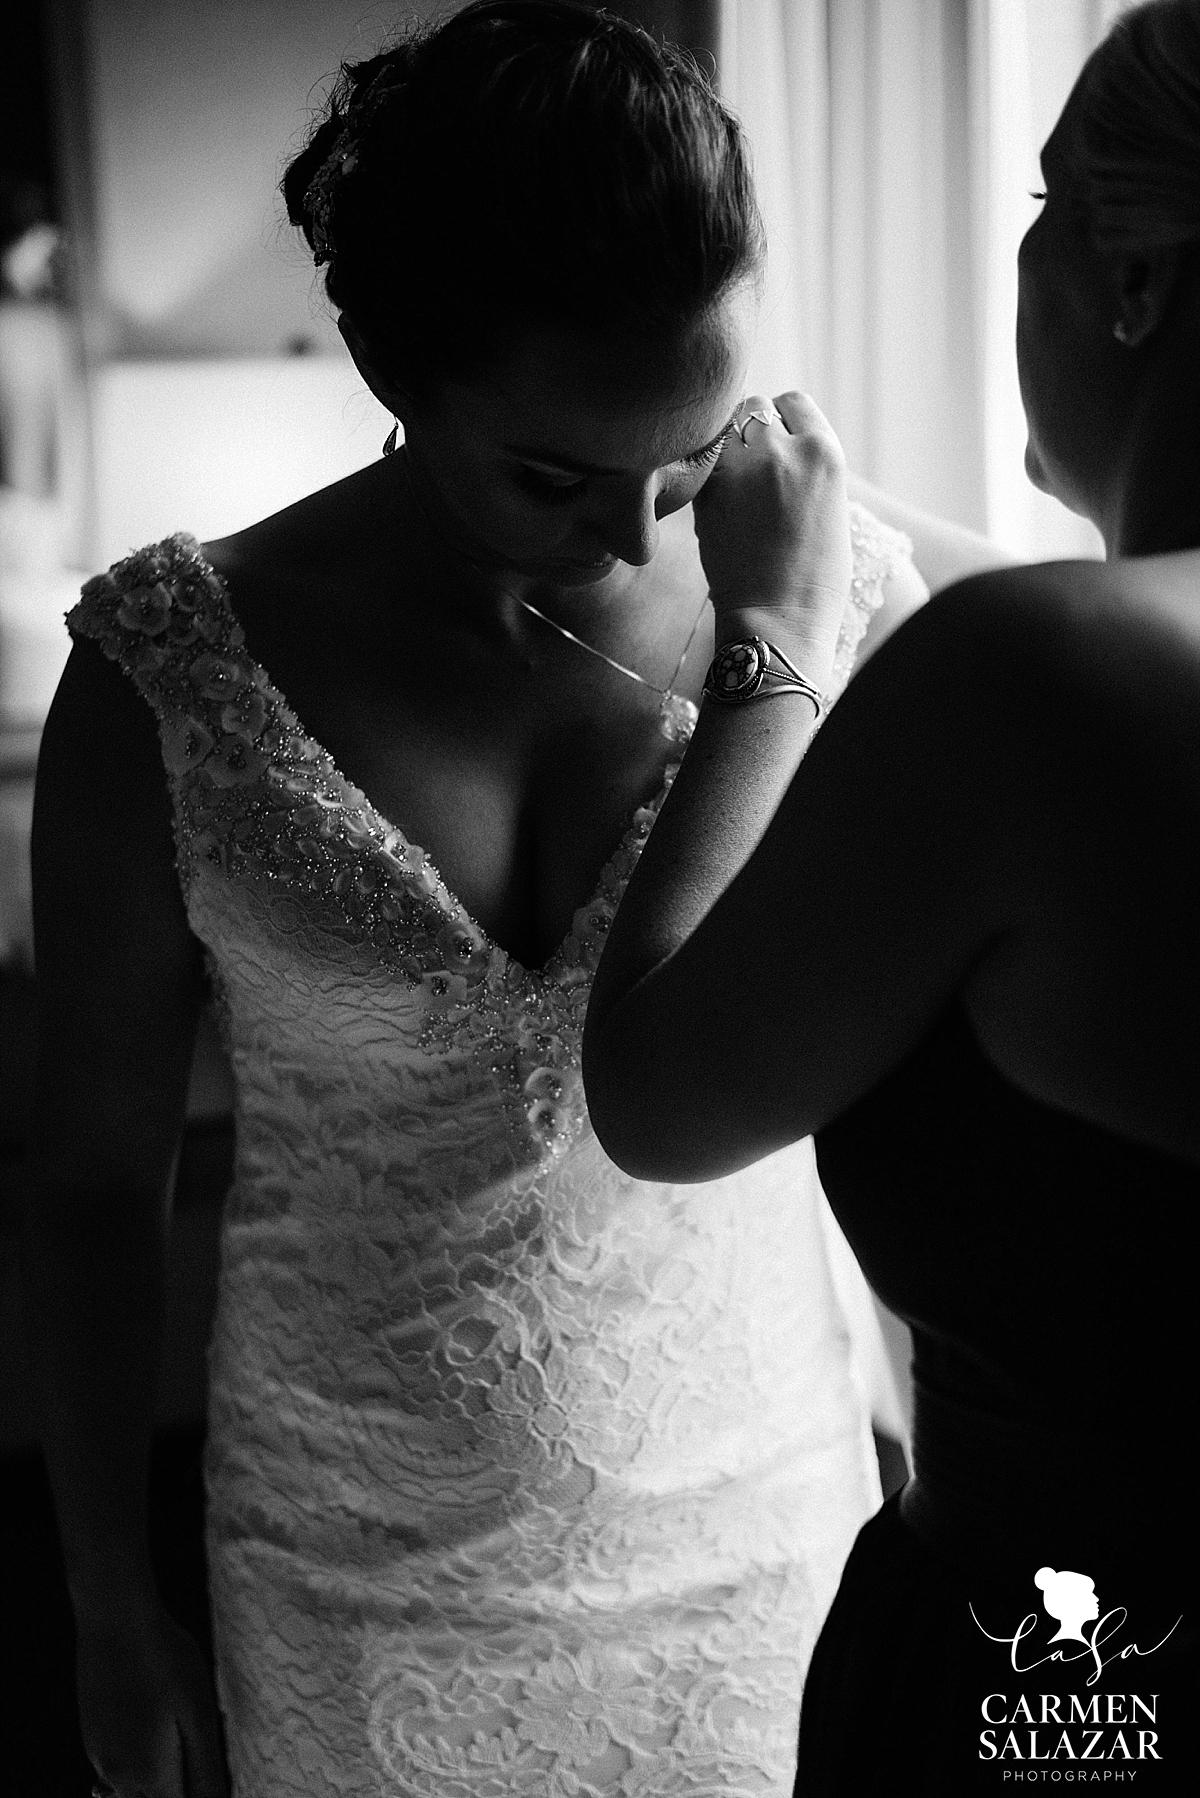 Black and White Bridal Portraits - Carmen Salazar